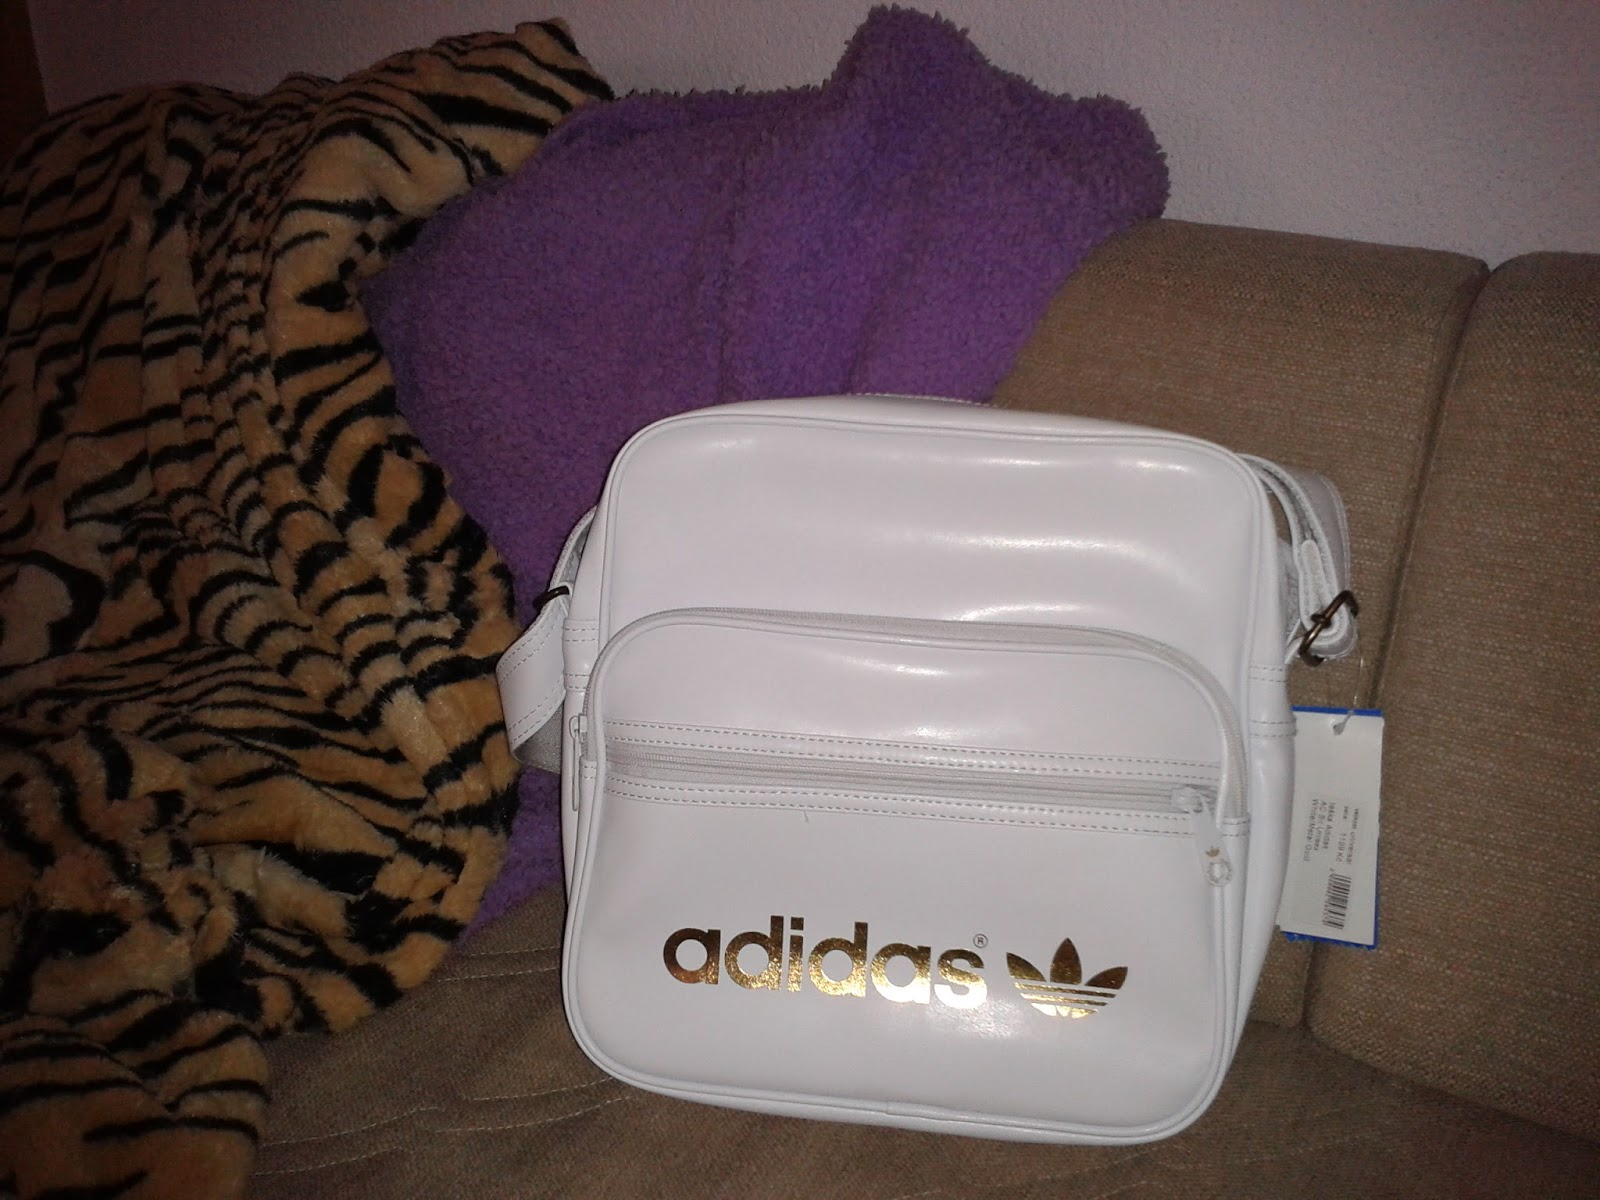 431e9b731 Kúpila som ju tu : http://www.snowboard-online.sk/taska-adidas -ac-sir-whitemetal-gold-13/